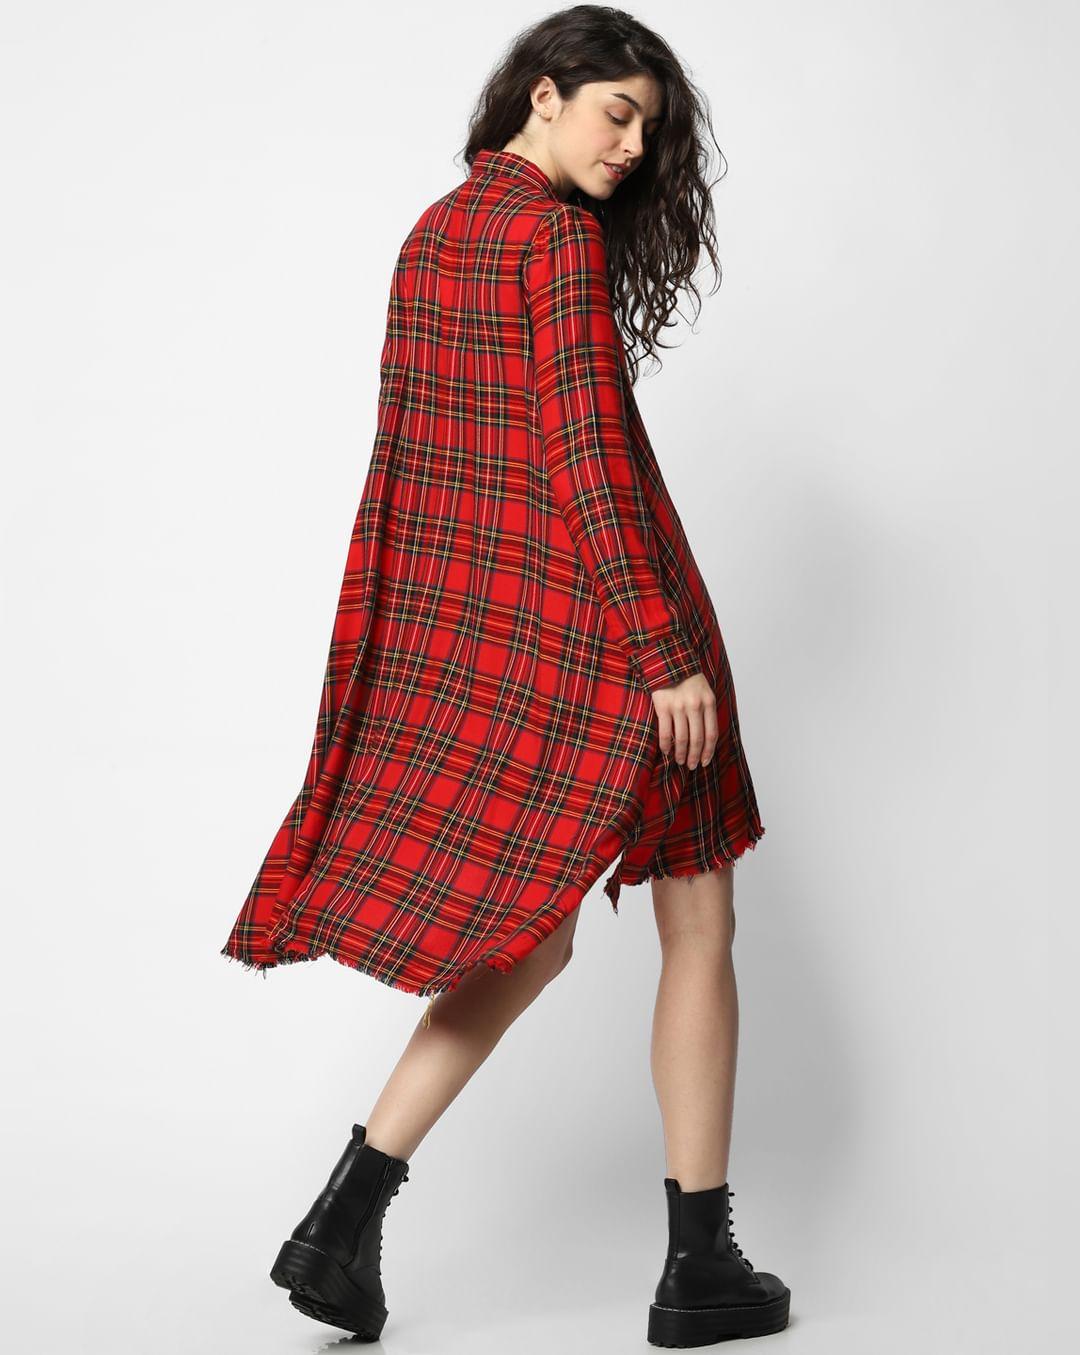 Buy Red Checks Shirt Dress for Women with Full Sleeves Online